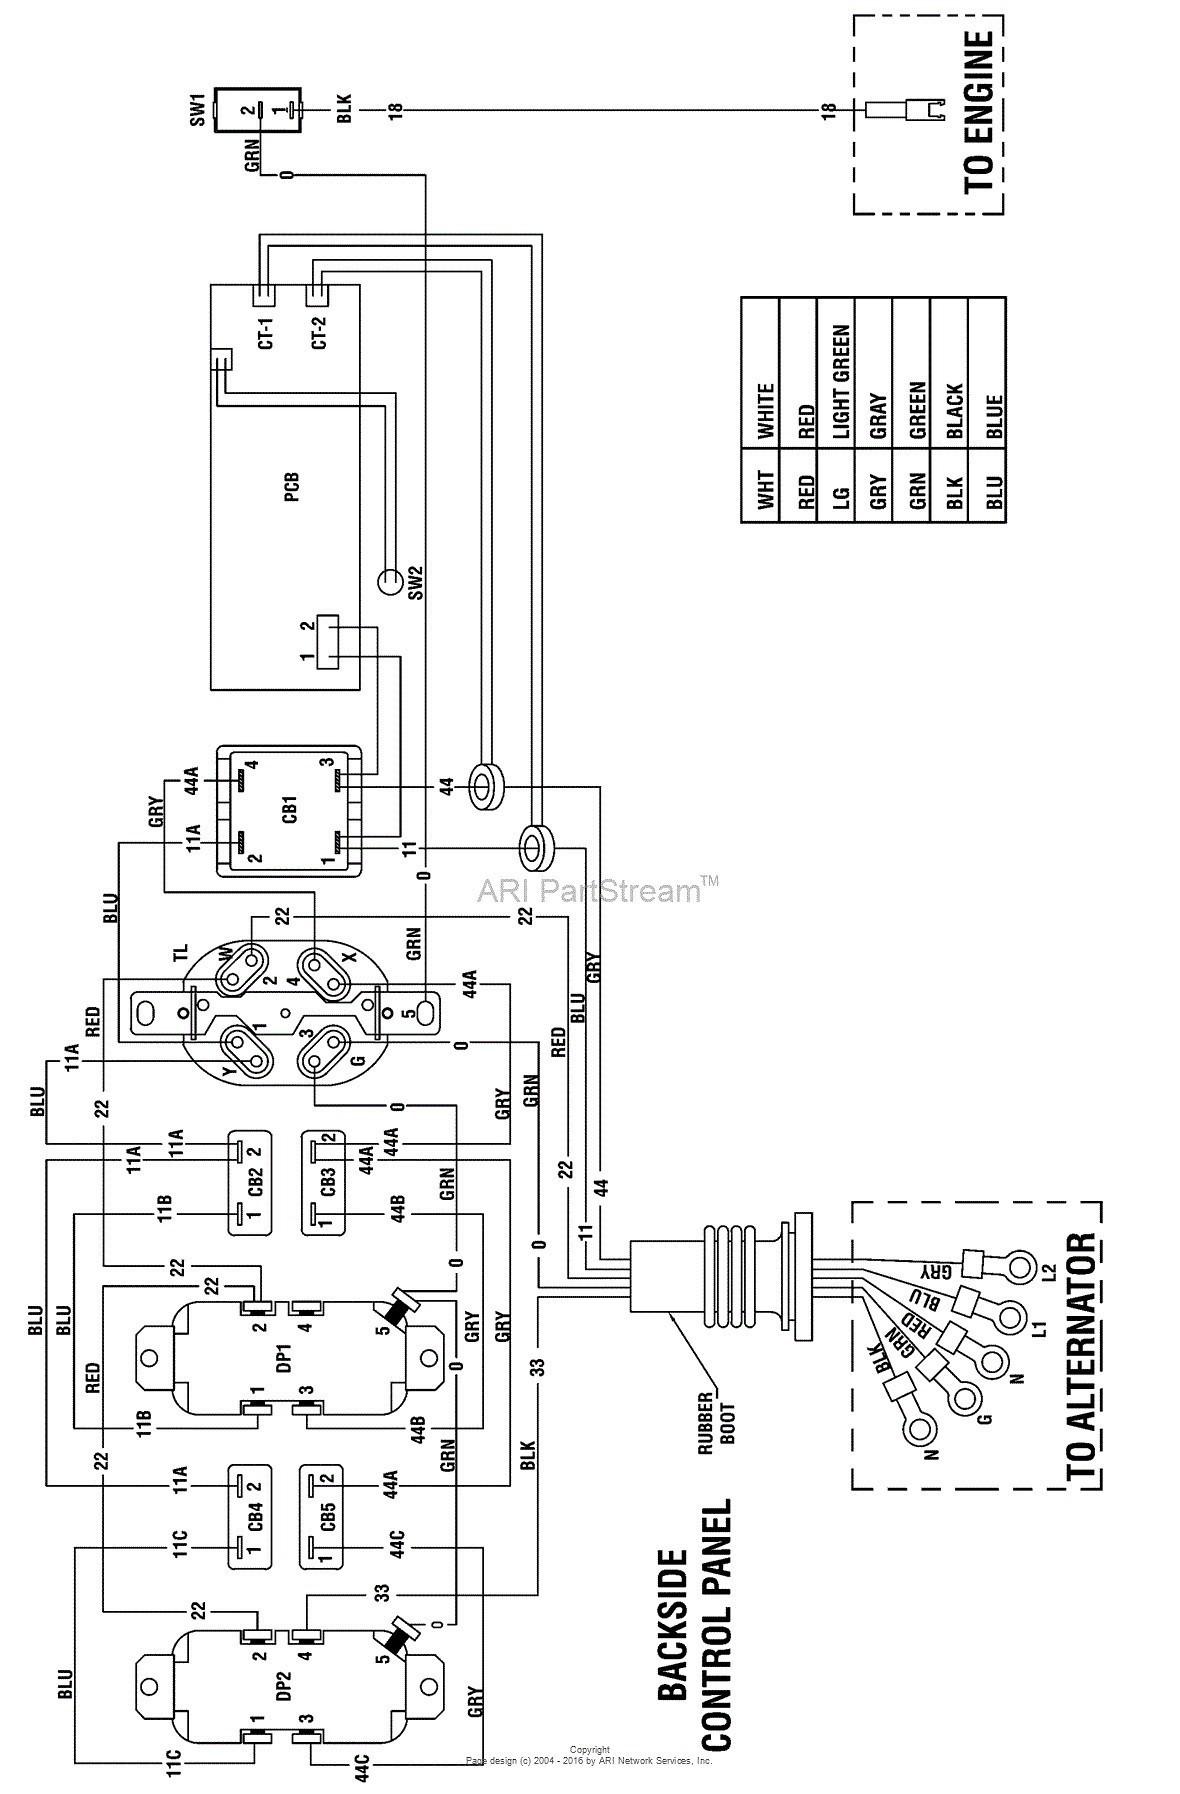 Vdo Oil Pressure Gauge Wiring Instructions Wiring Diagram Oil Pressure 1992 Lumina Of Vdo Oil Pressure Gauge Wiring Instructions